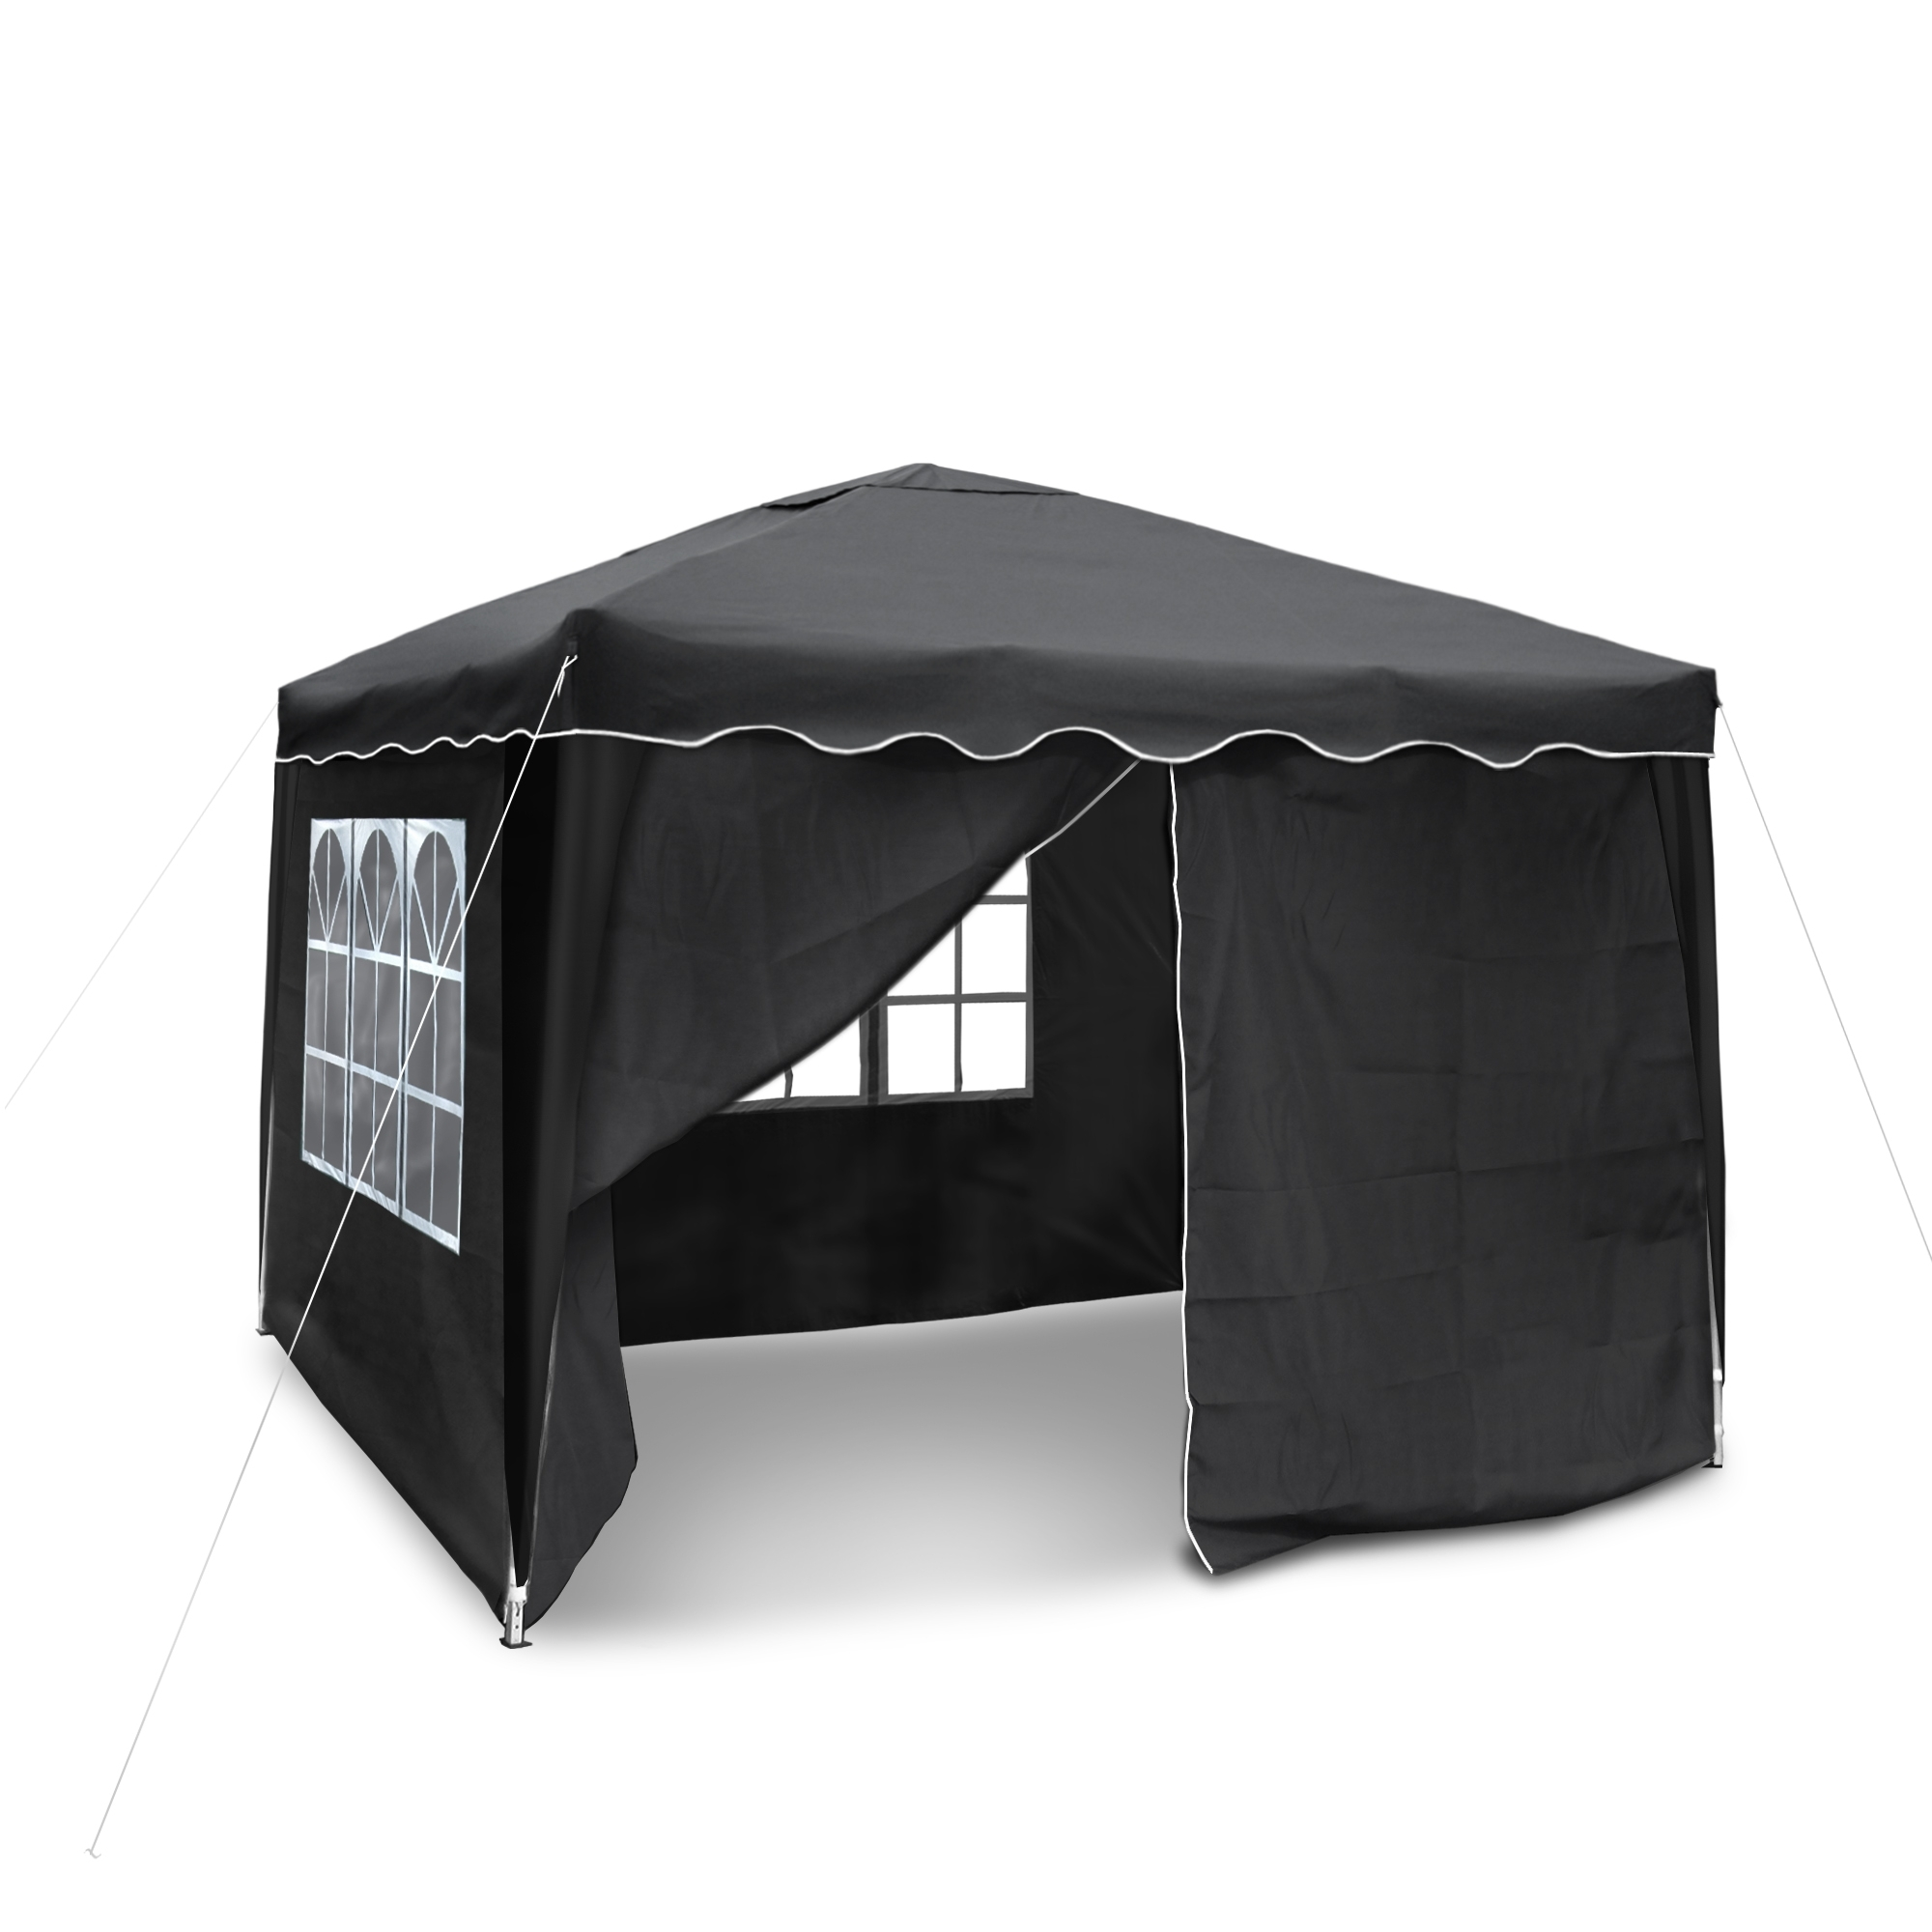 gartenpavillon falt pavillon 3 x 3 m material oxford. Black Bedroom Furniture Sets. Home Design Ideas